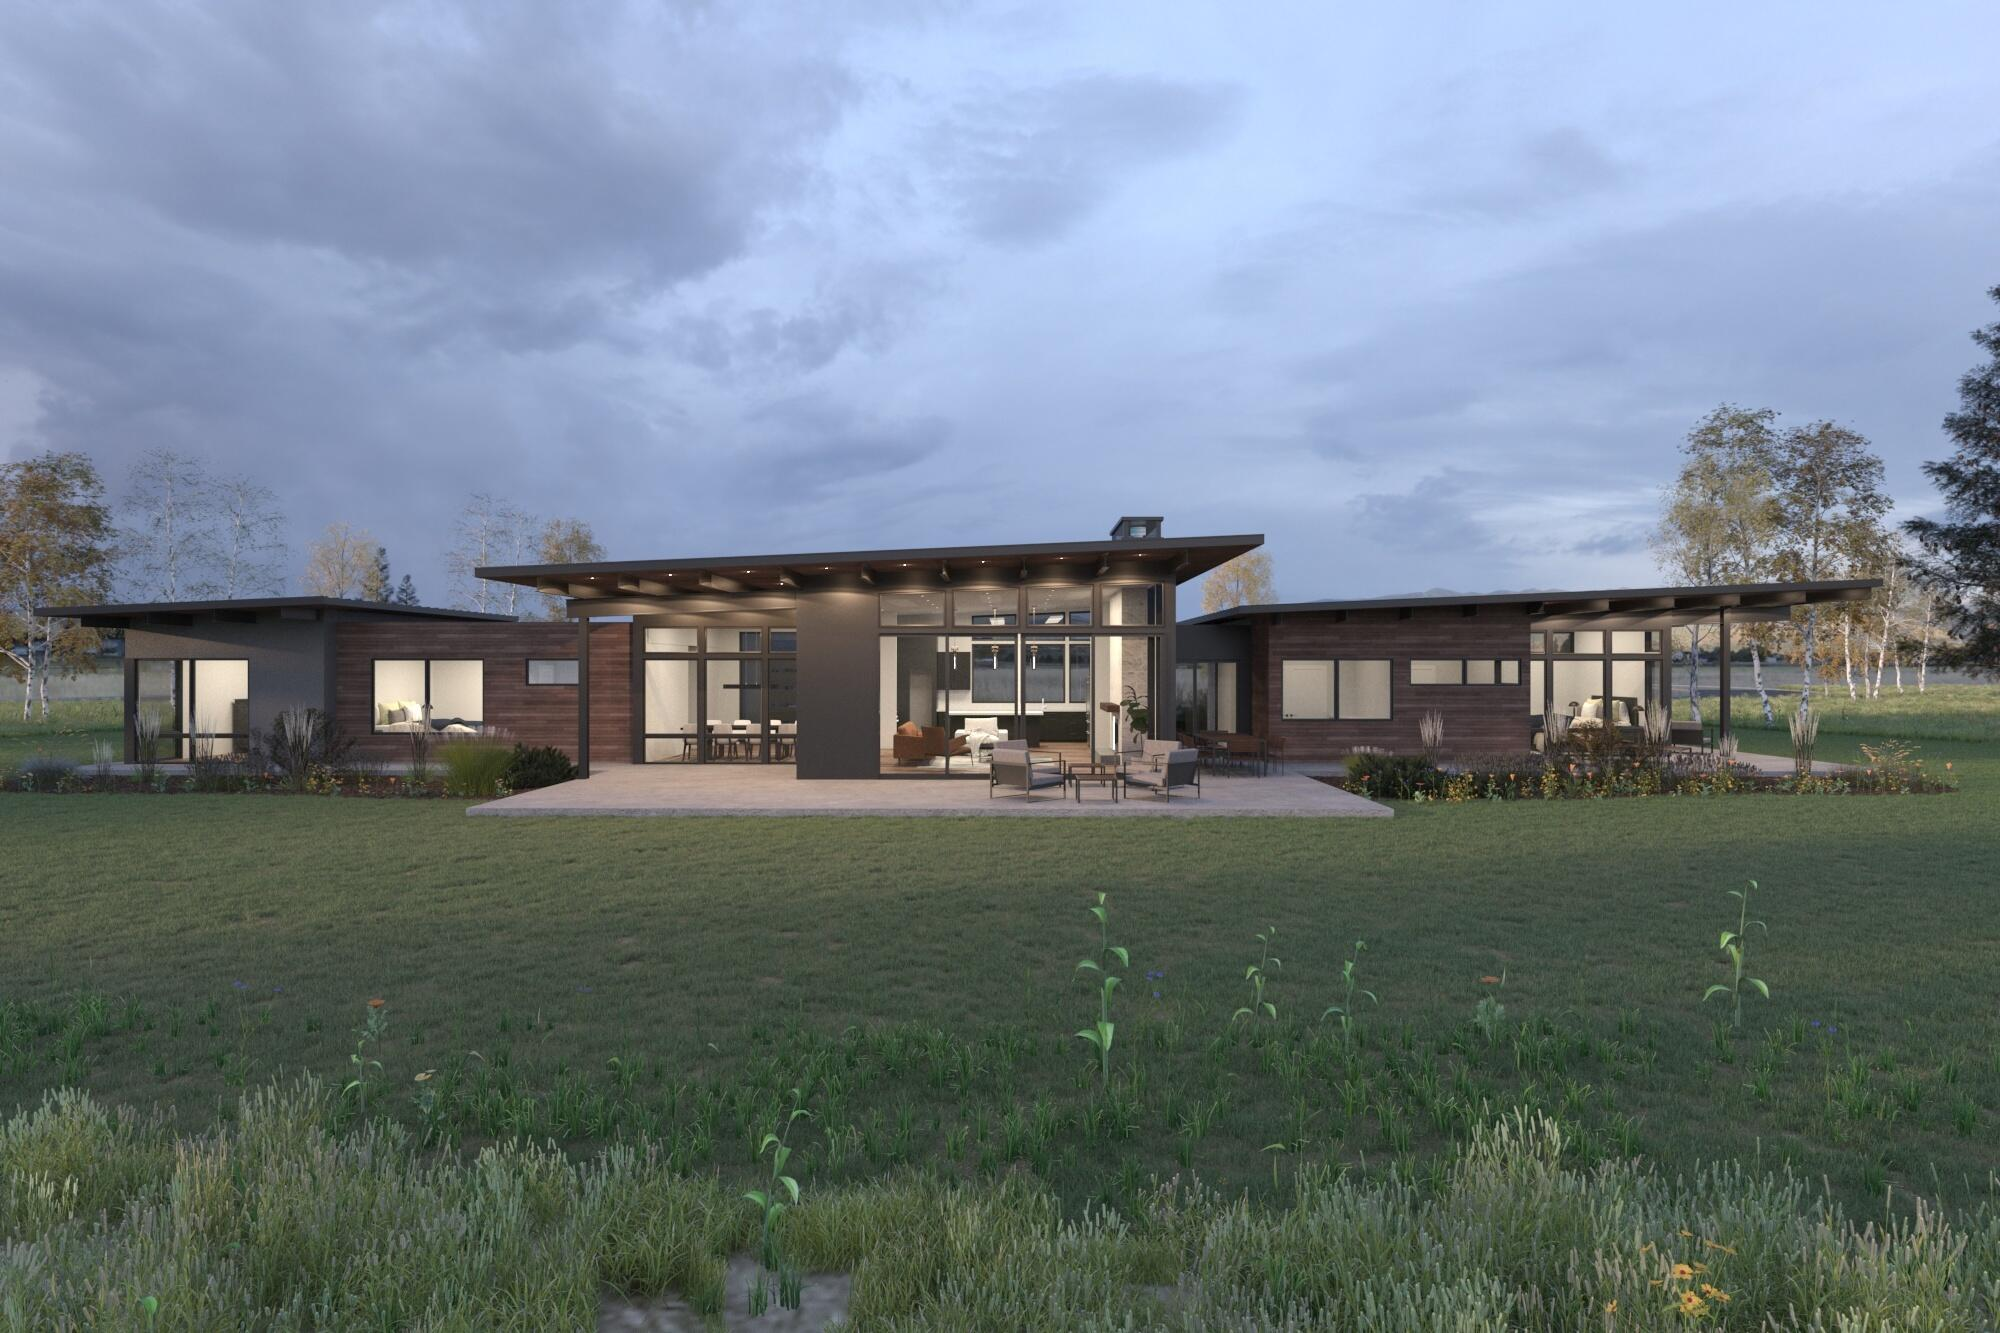 Nhn Royal Coachman Drive Lot 3, Missoula, MT 59808